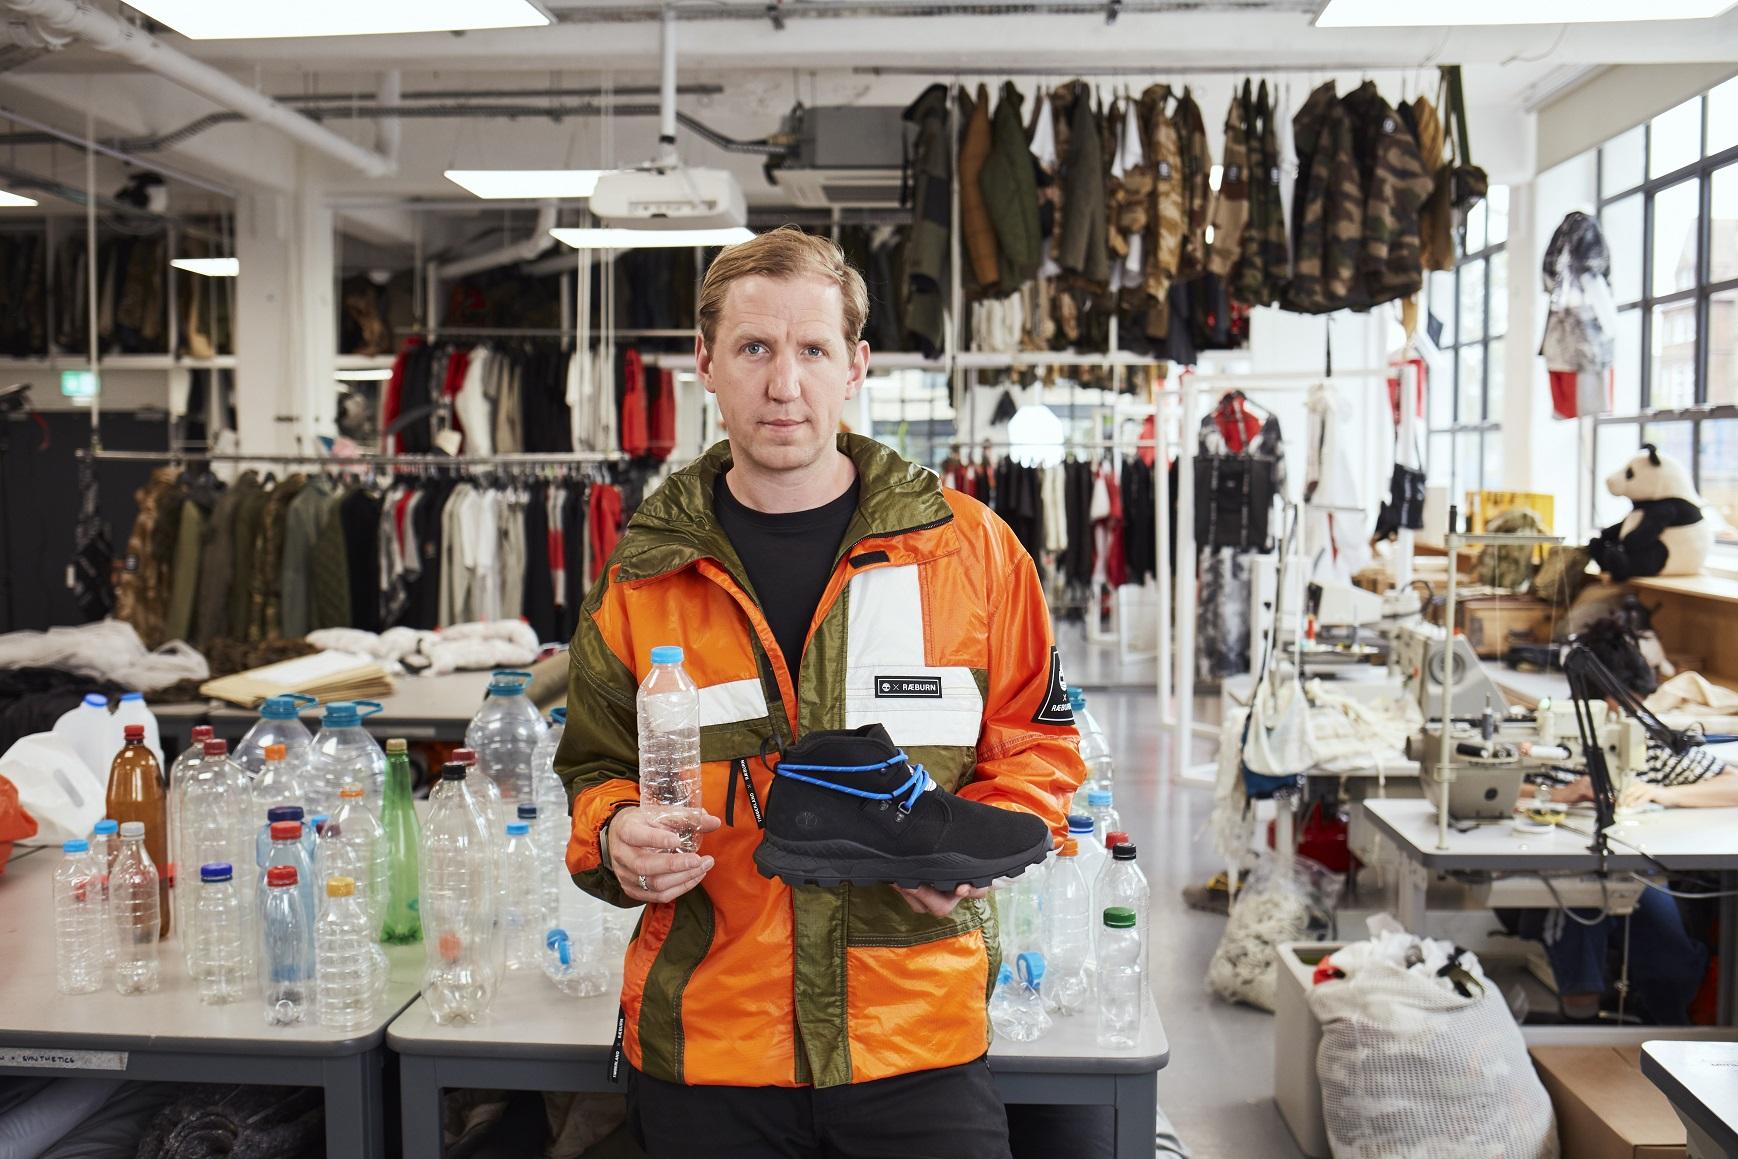 TIMBERLAND(ティンバーランド) 、リサイクル素材や再生可能素材を使用したTHE BROOKLYN REBOOT COLLECTIONを販売